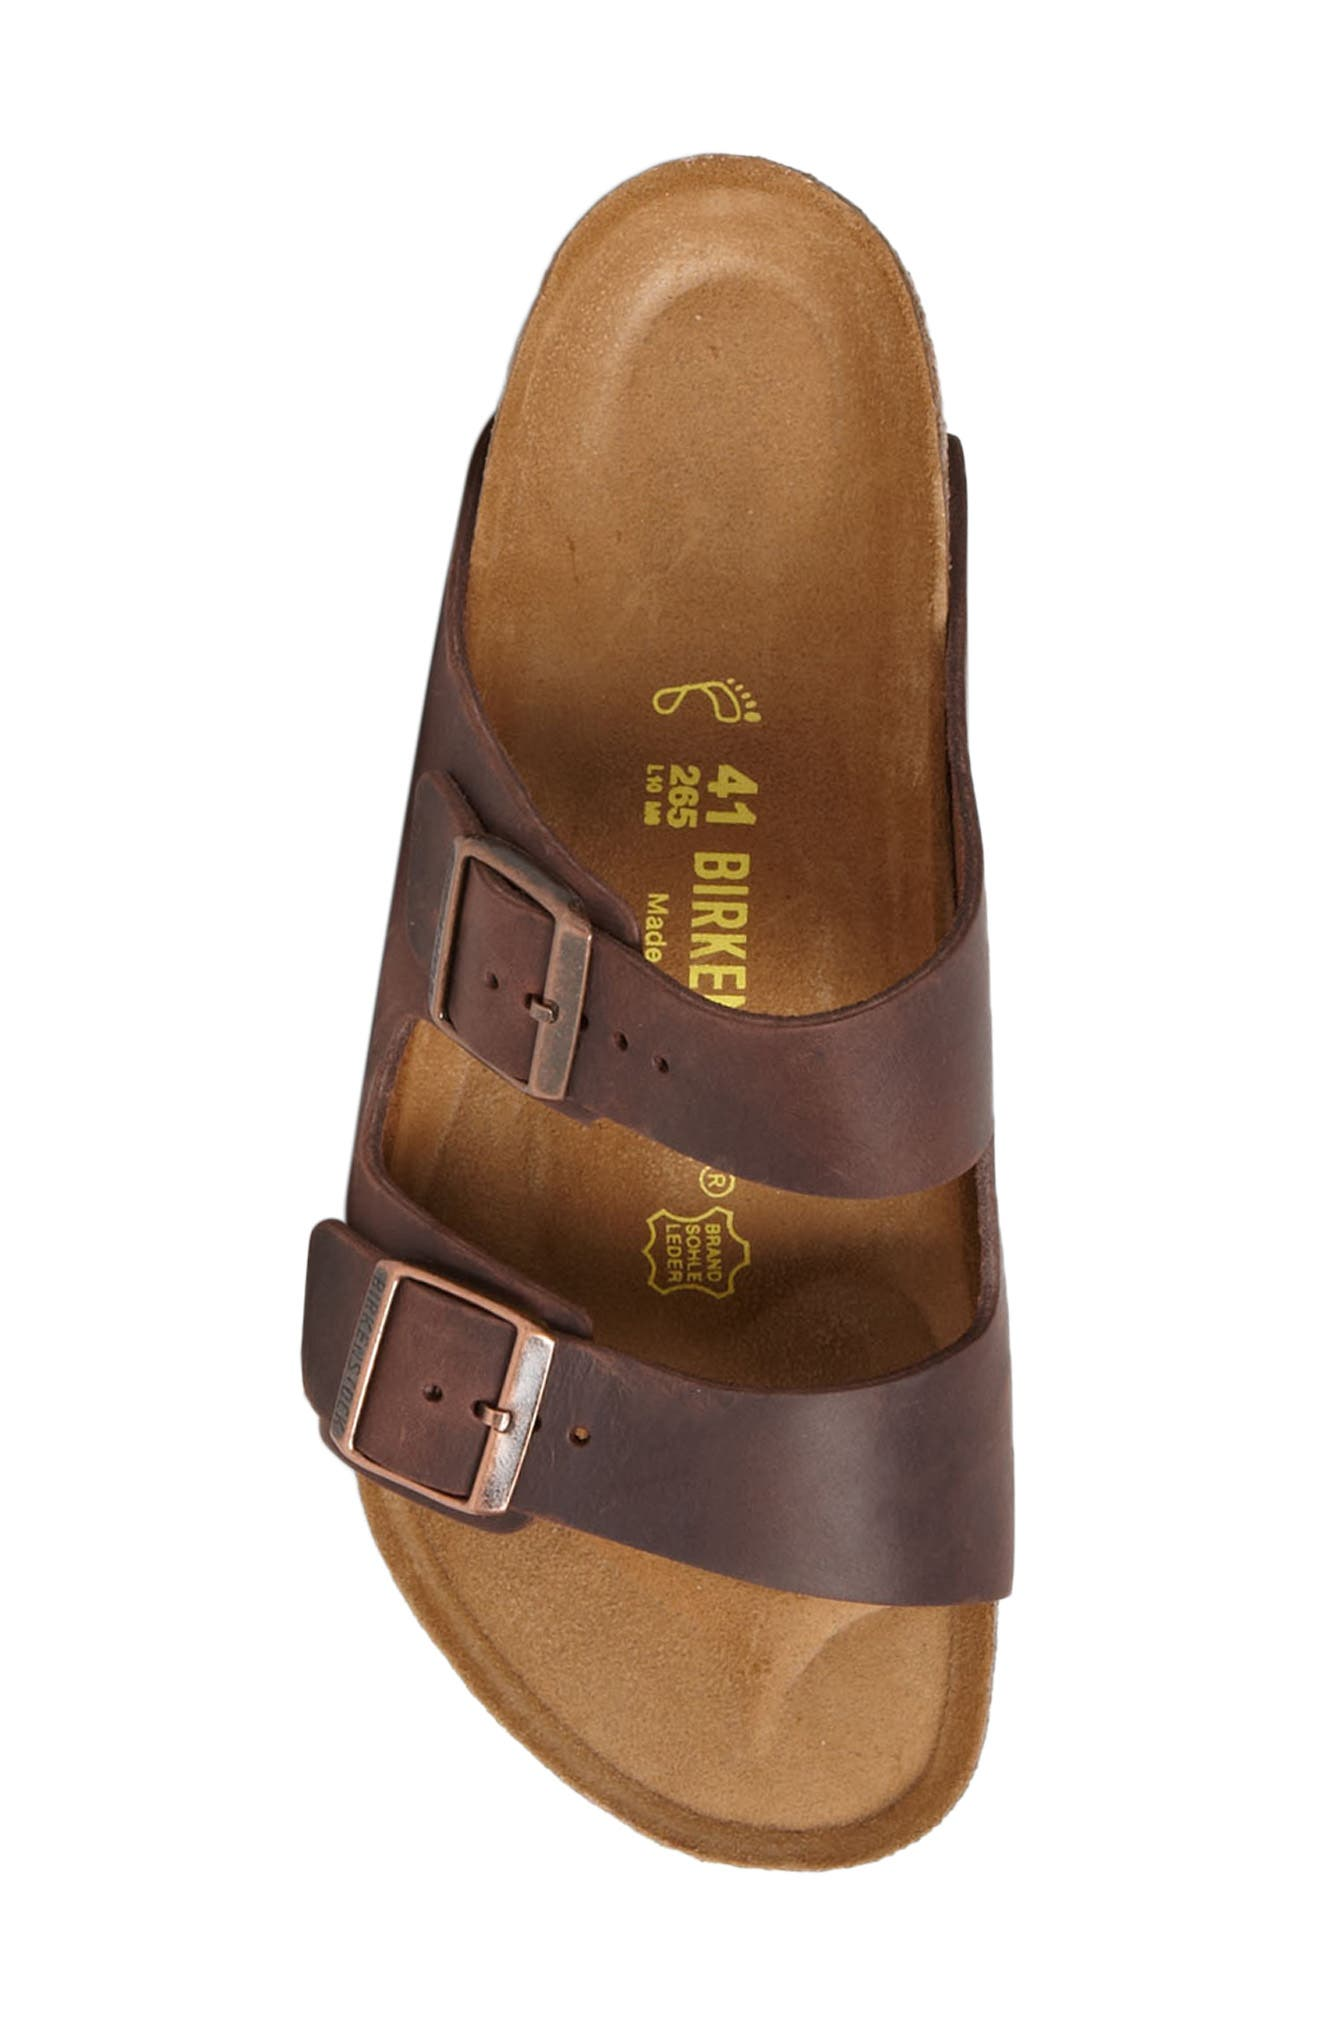 Arizona Slide Sandal,                             Alternate thumbnail 3, color,                             HABANA OILED BROWN